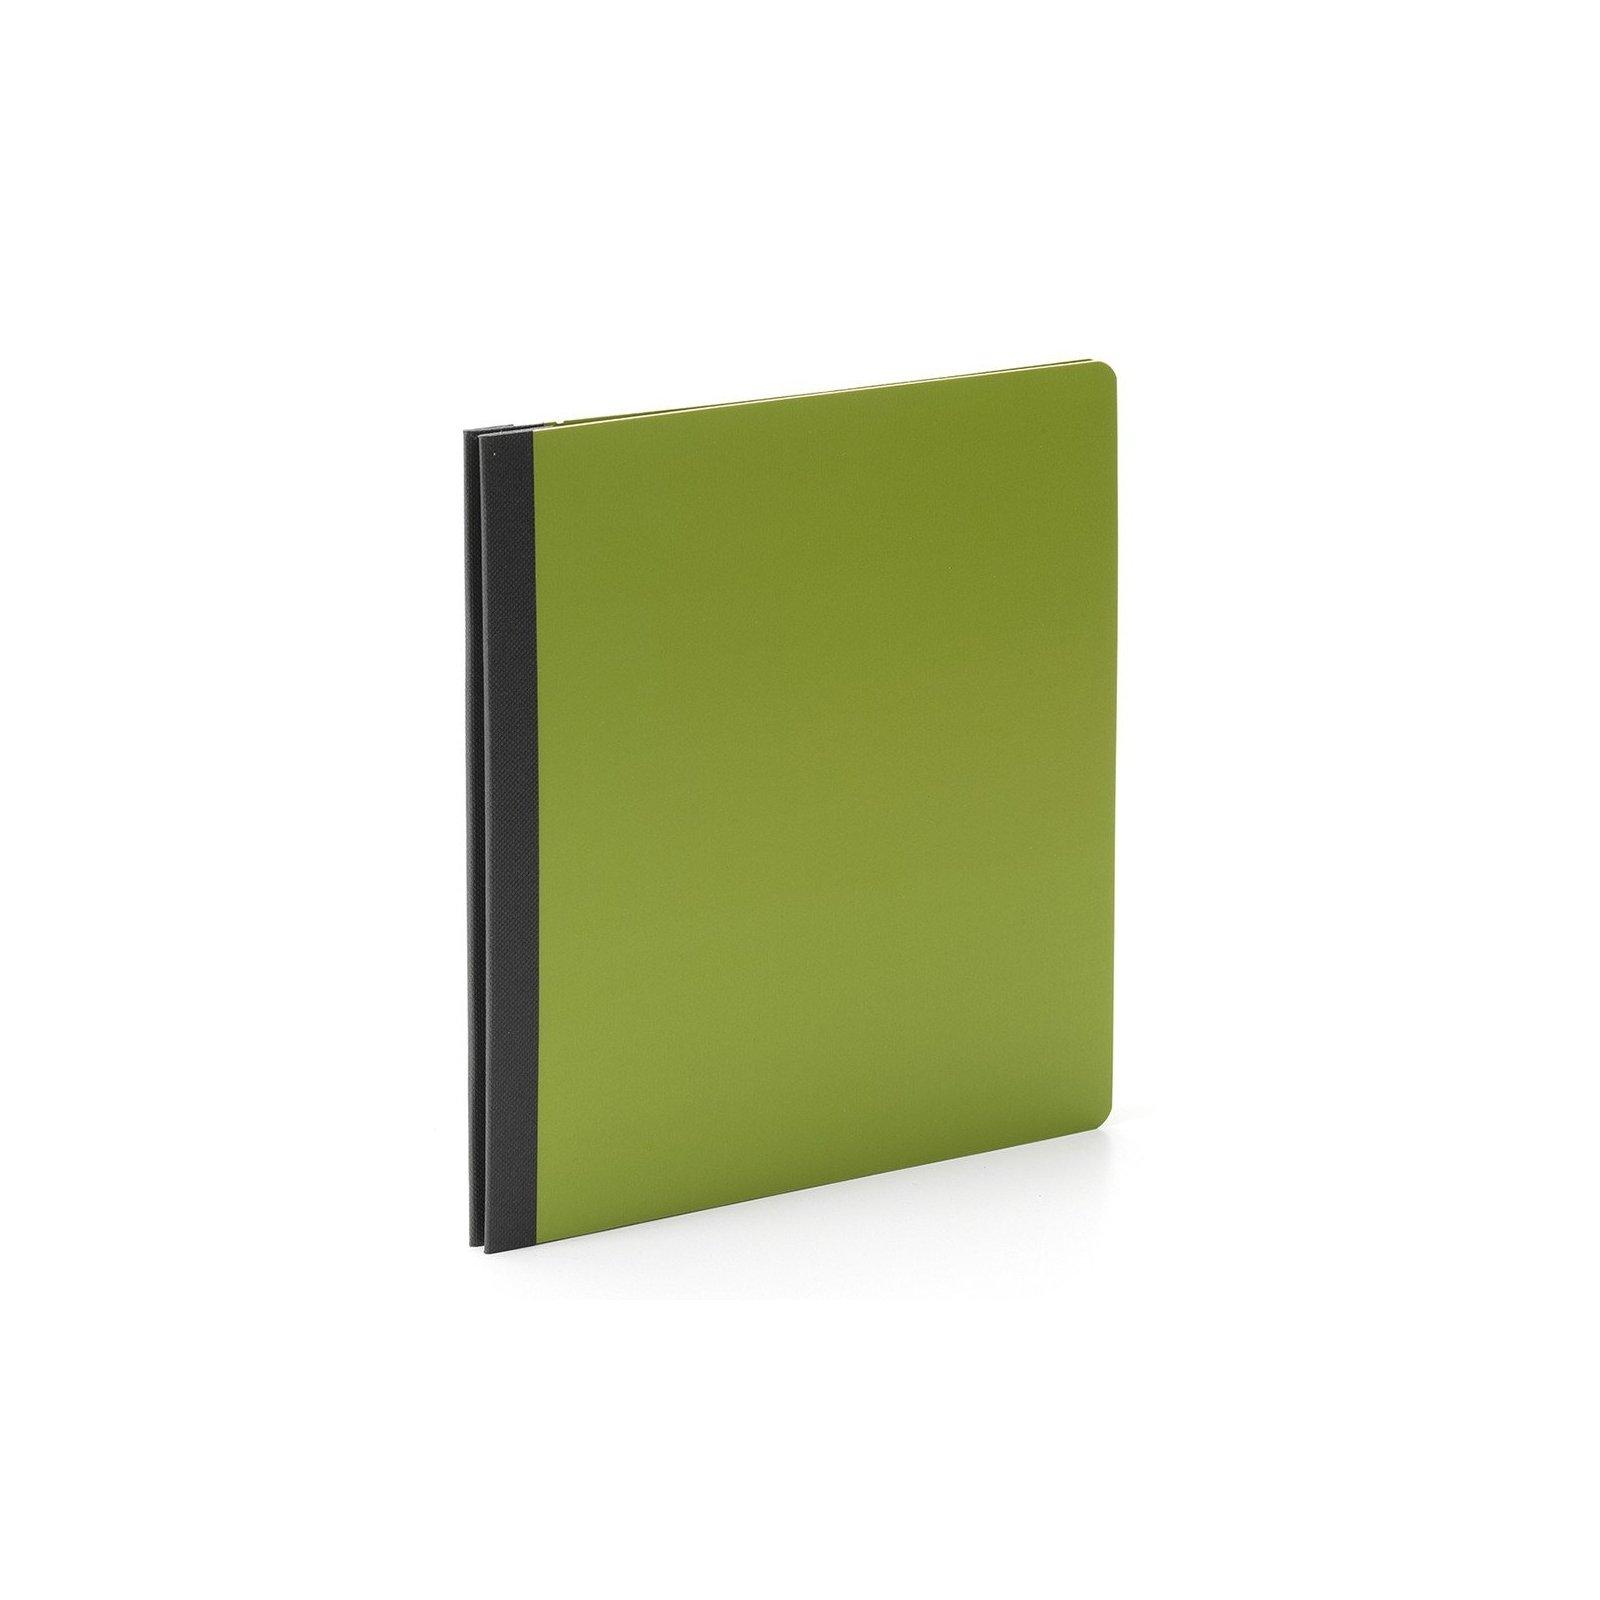 Flipbook - 15x20 - Vert - Simple Stories